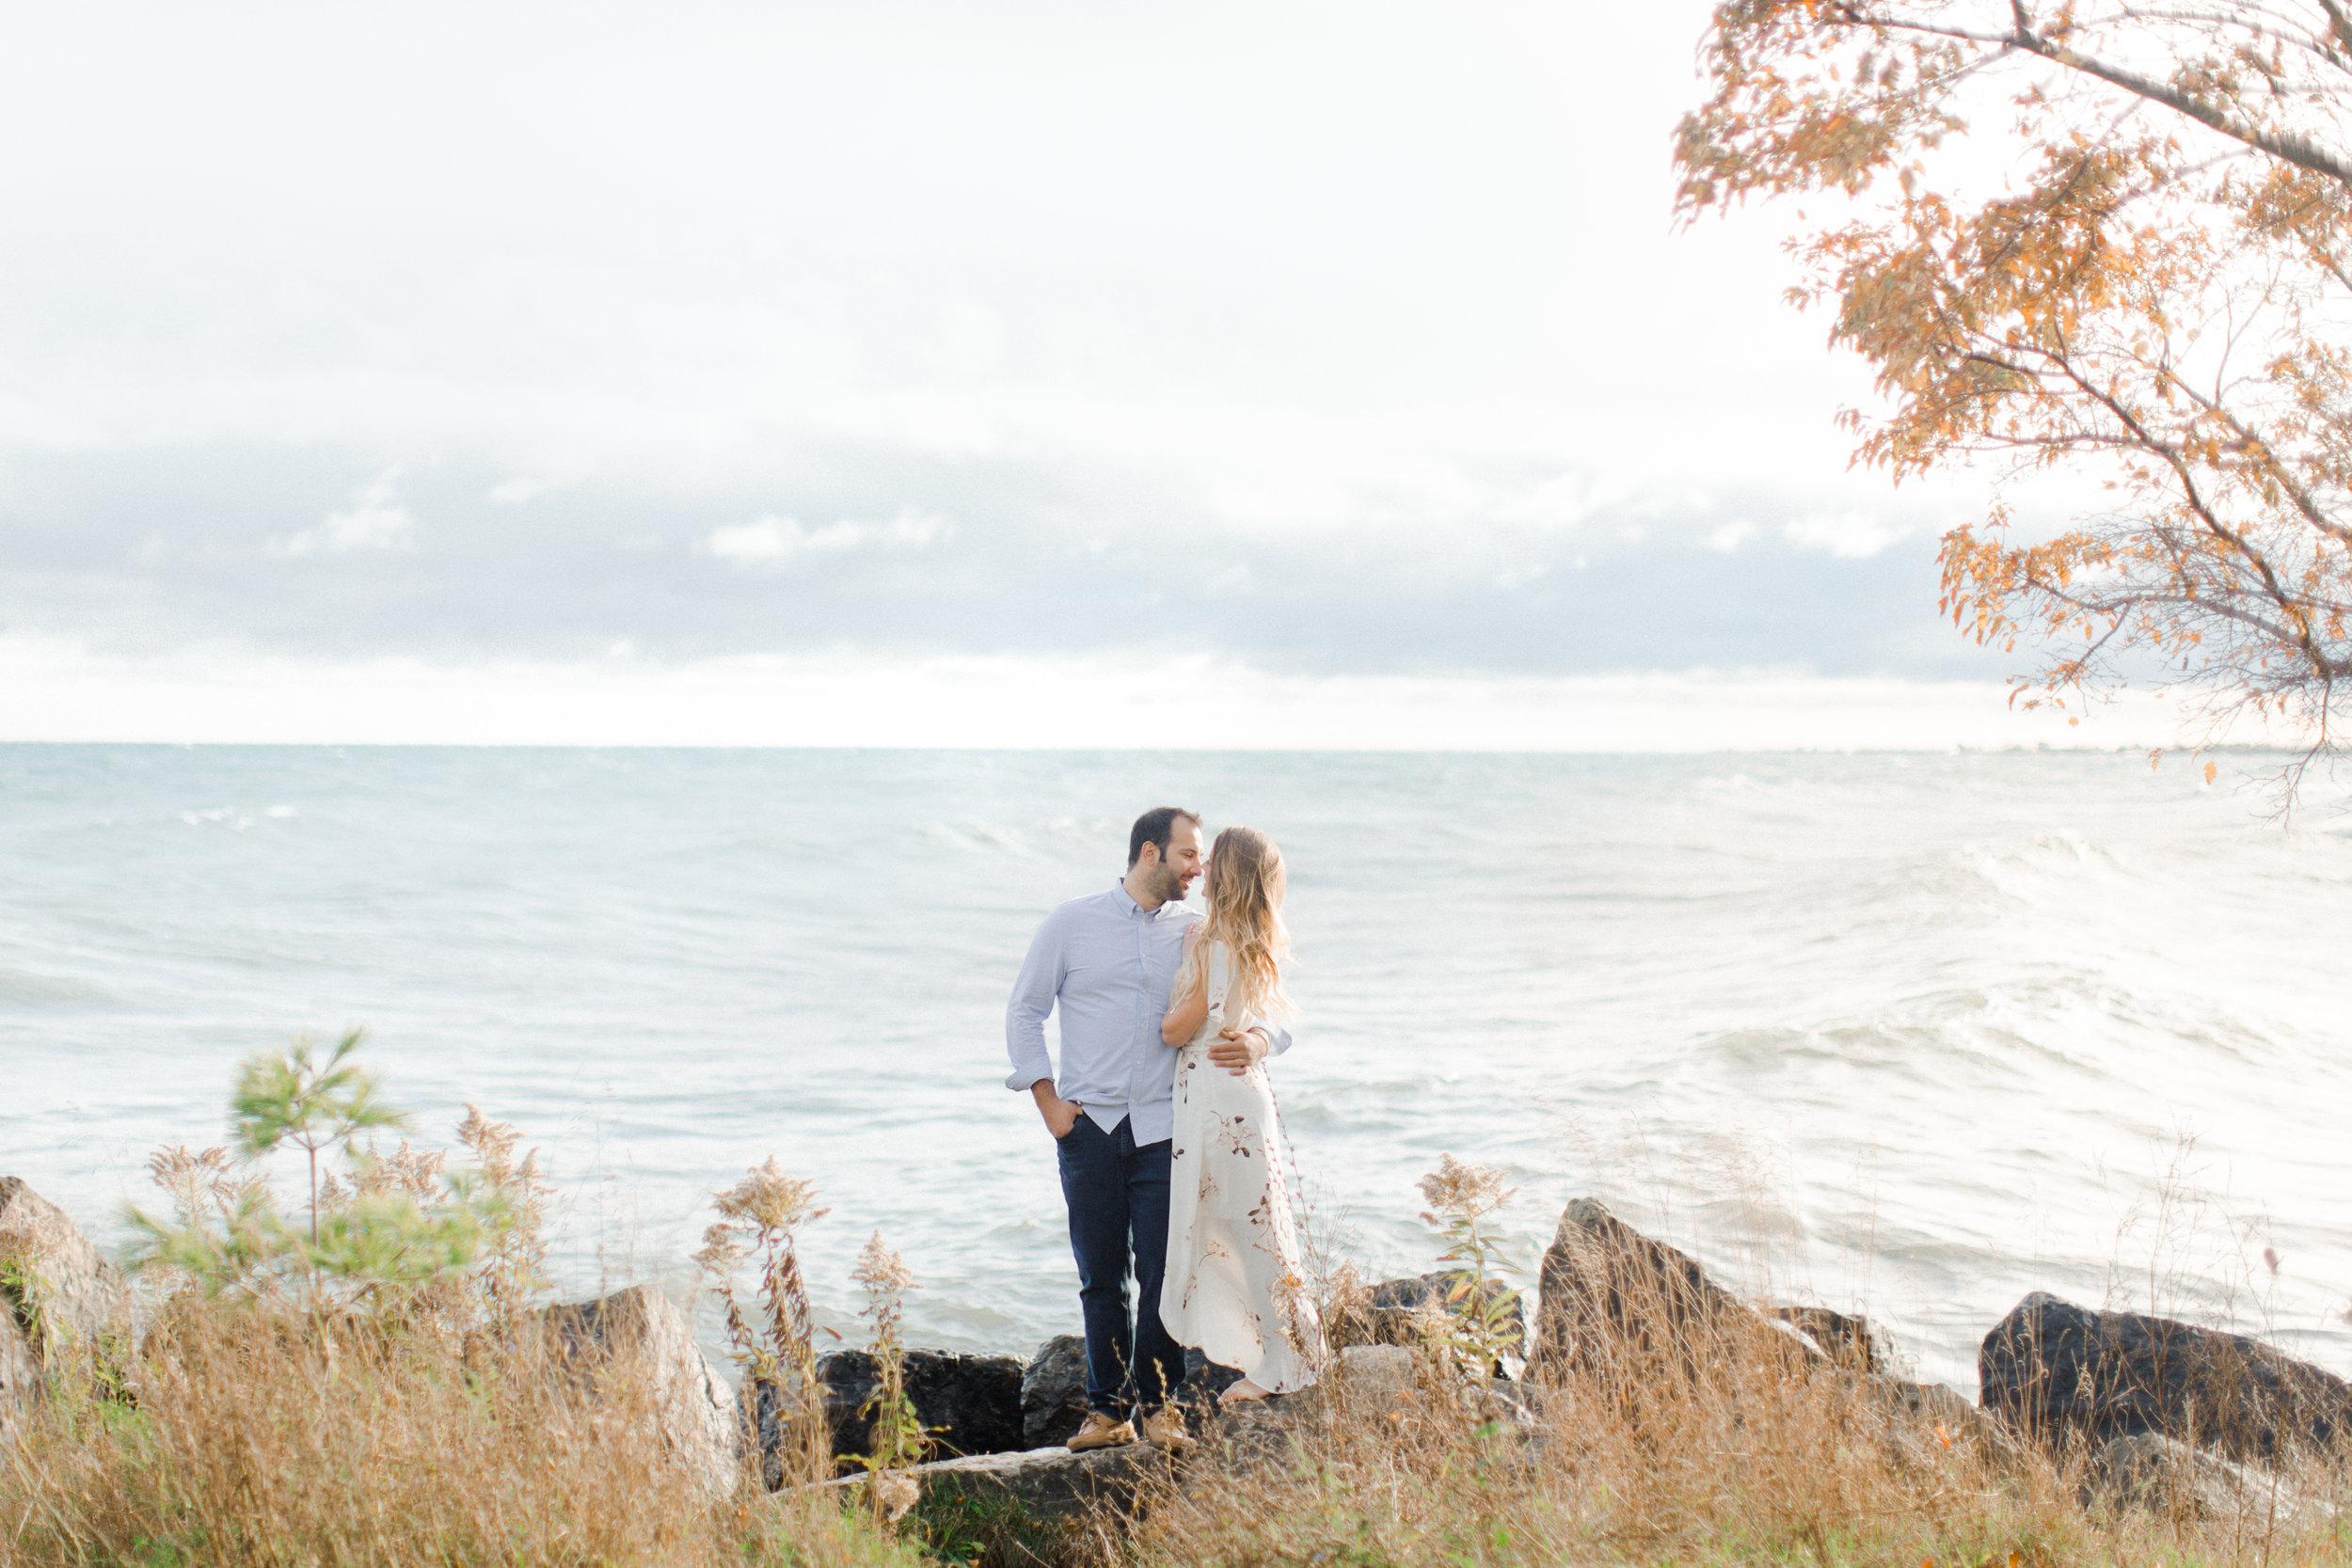 ashbridges-bay-toronto-wedding-photographer-soft-bright-pretty-pastel-richelle-hunter-lauren-miller-heather-chris-previews-1-2.jpg